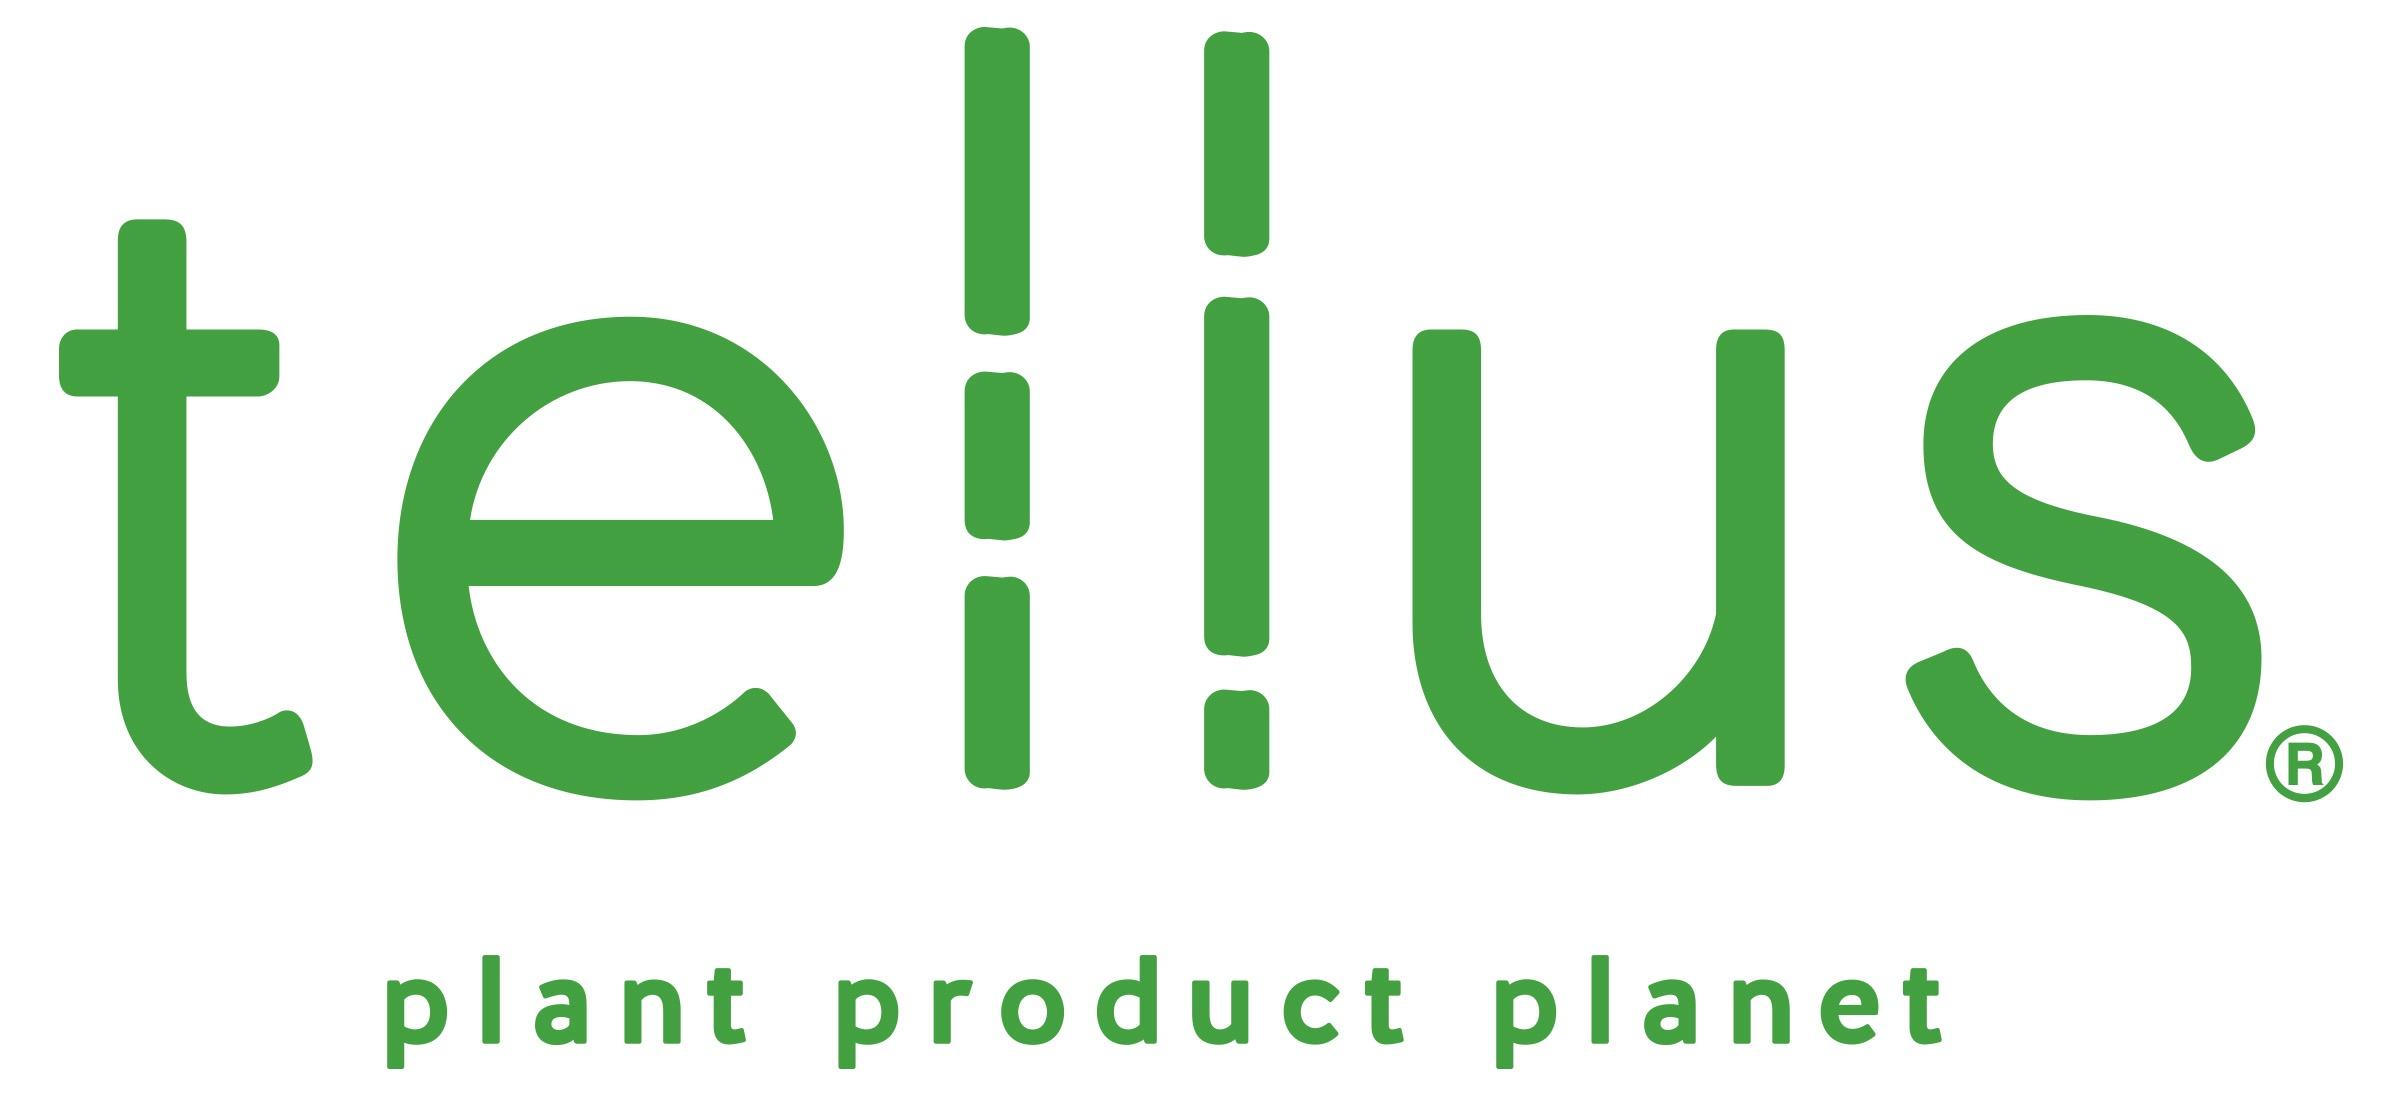 Tellus Logo w Tagline